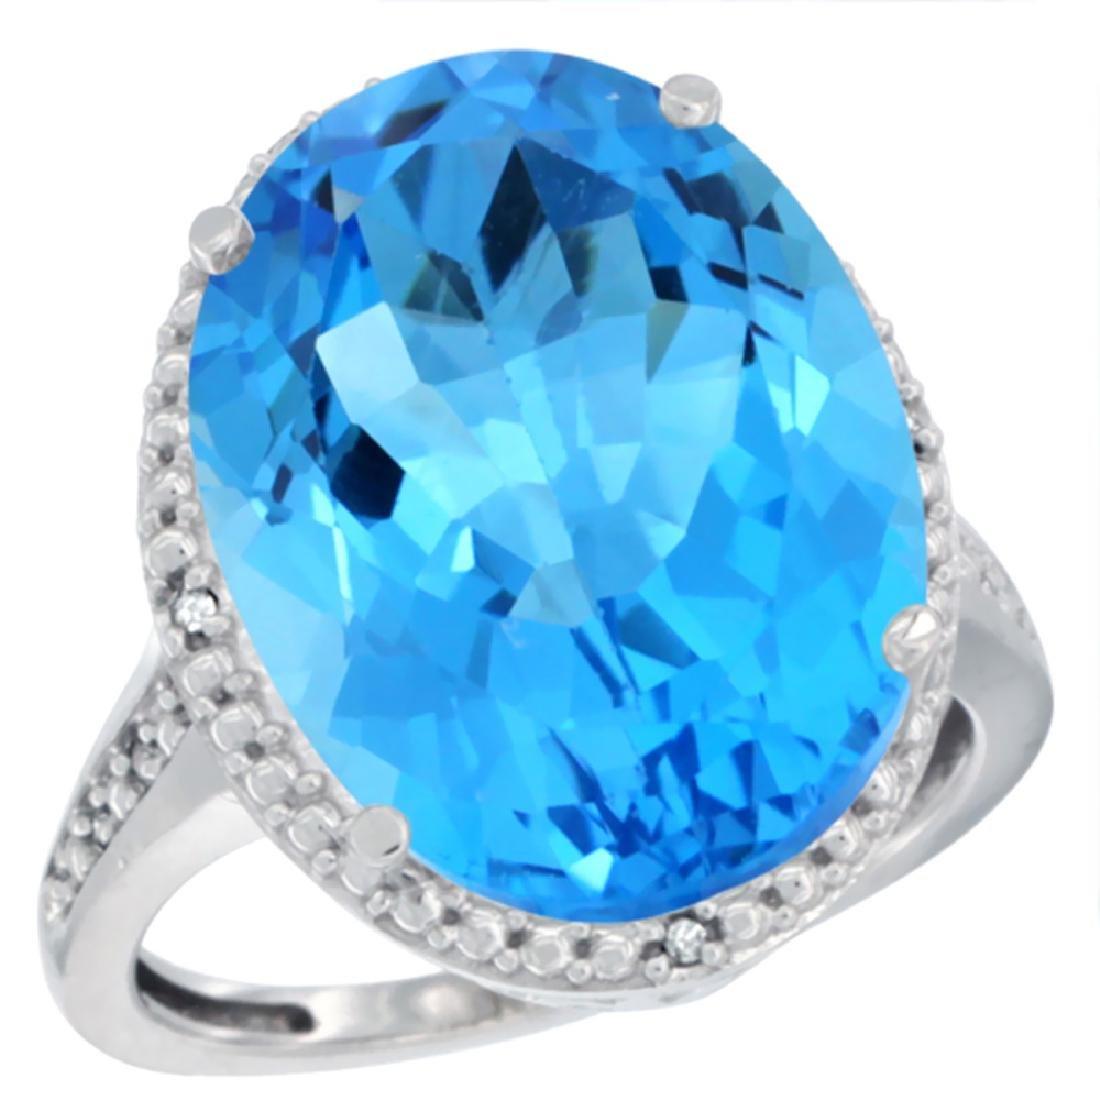 Natural 13.6 ctw Swiss-blue-topaz & Diamond Engagement